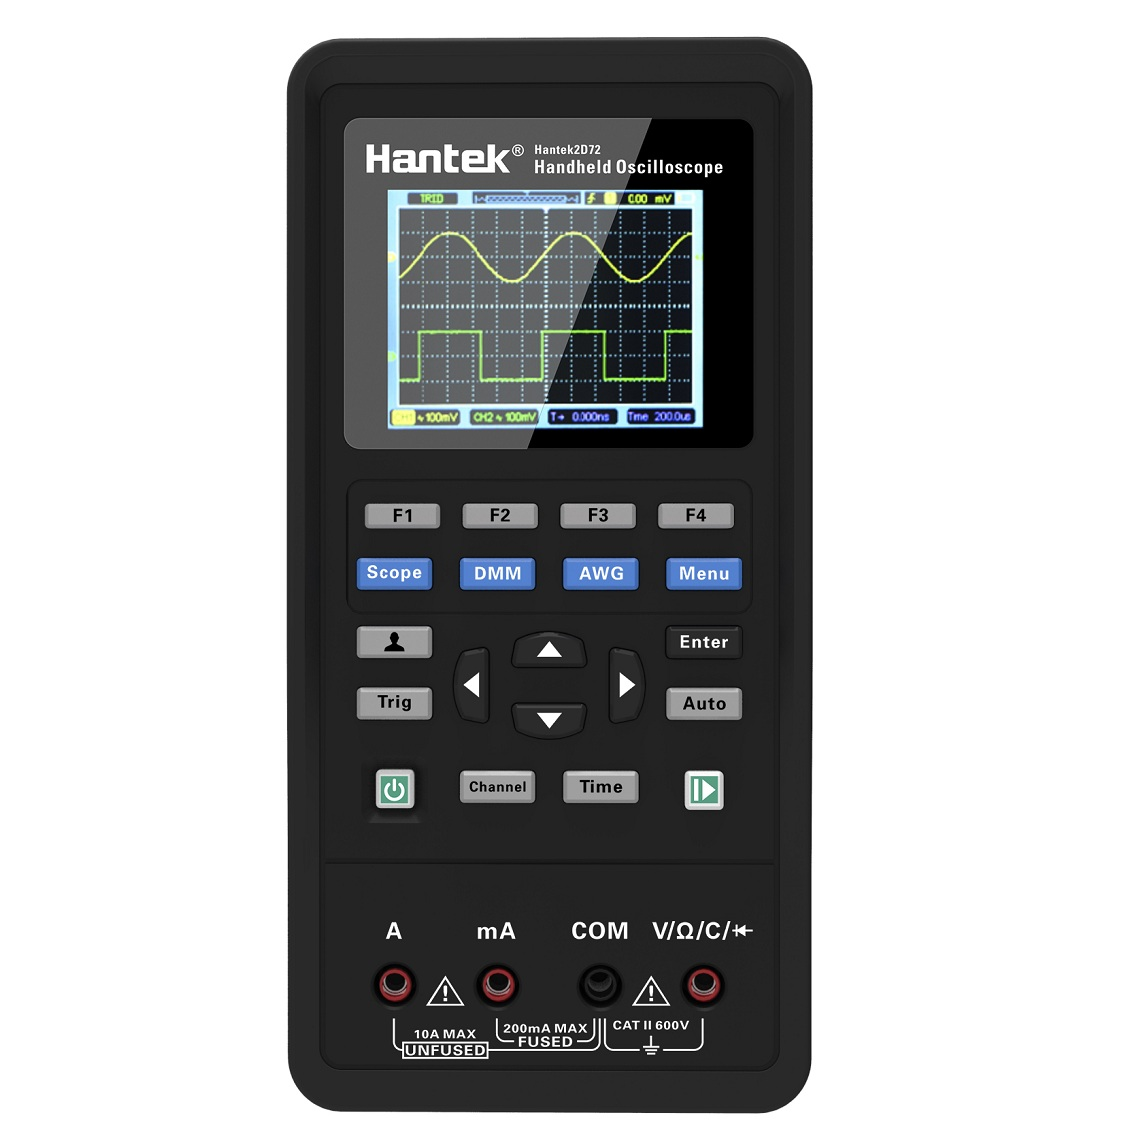 Hantek 3in1 Digital Oscilloscope+Waveform Generator+Multimeter Portable USB 2 Channels 40mhz 70mhz LCD Display Test Meter Tools-in Oscilloscopes from Tools    1